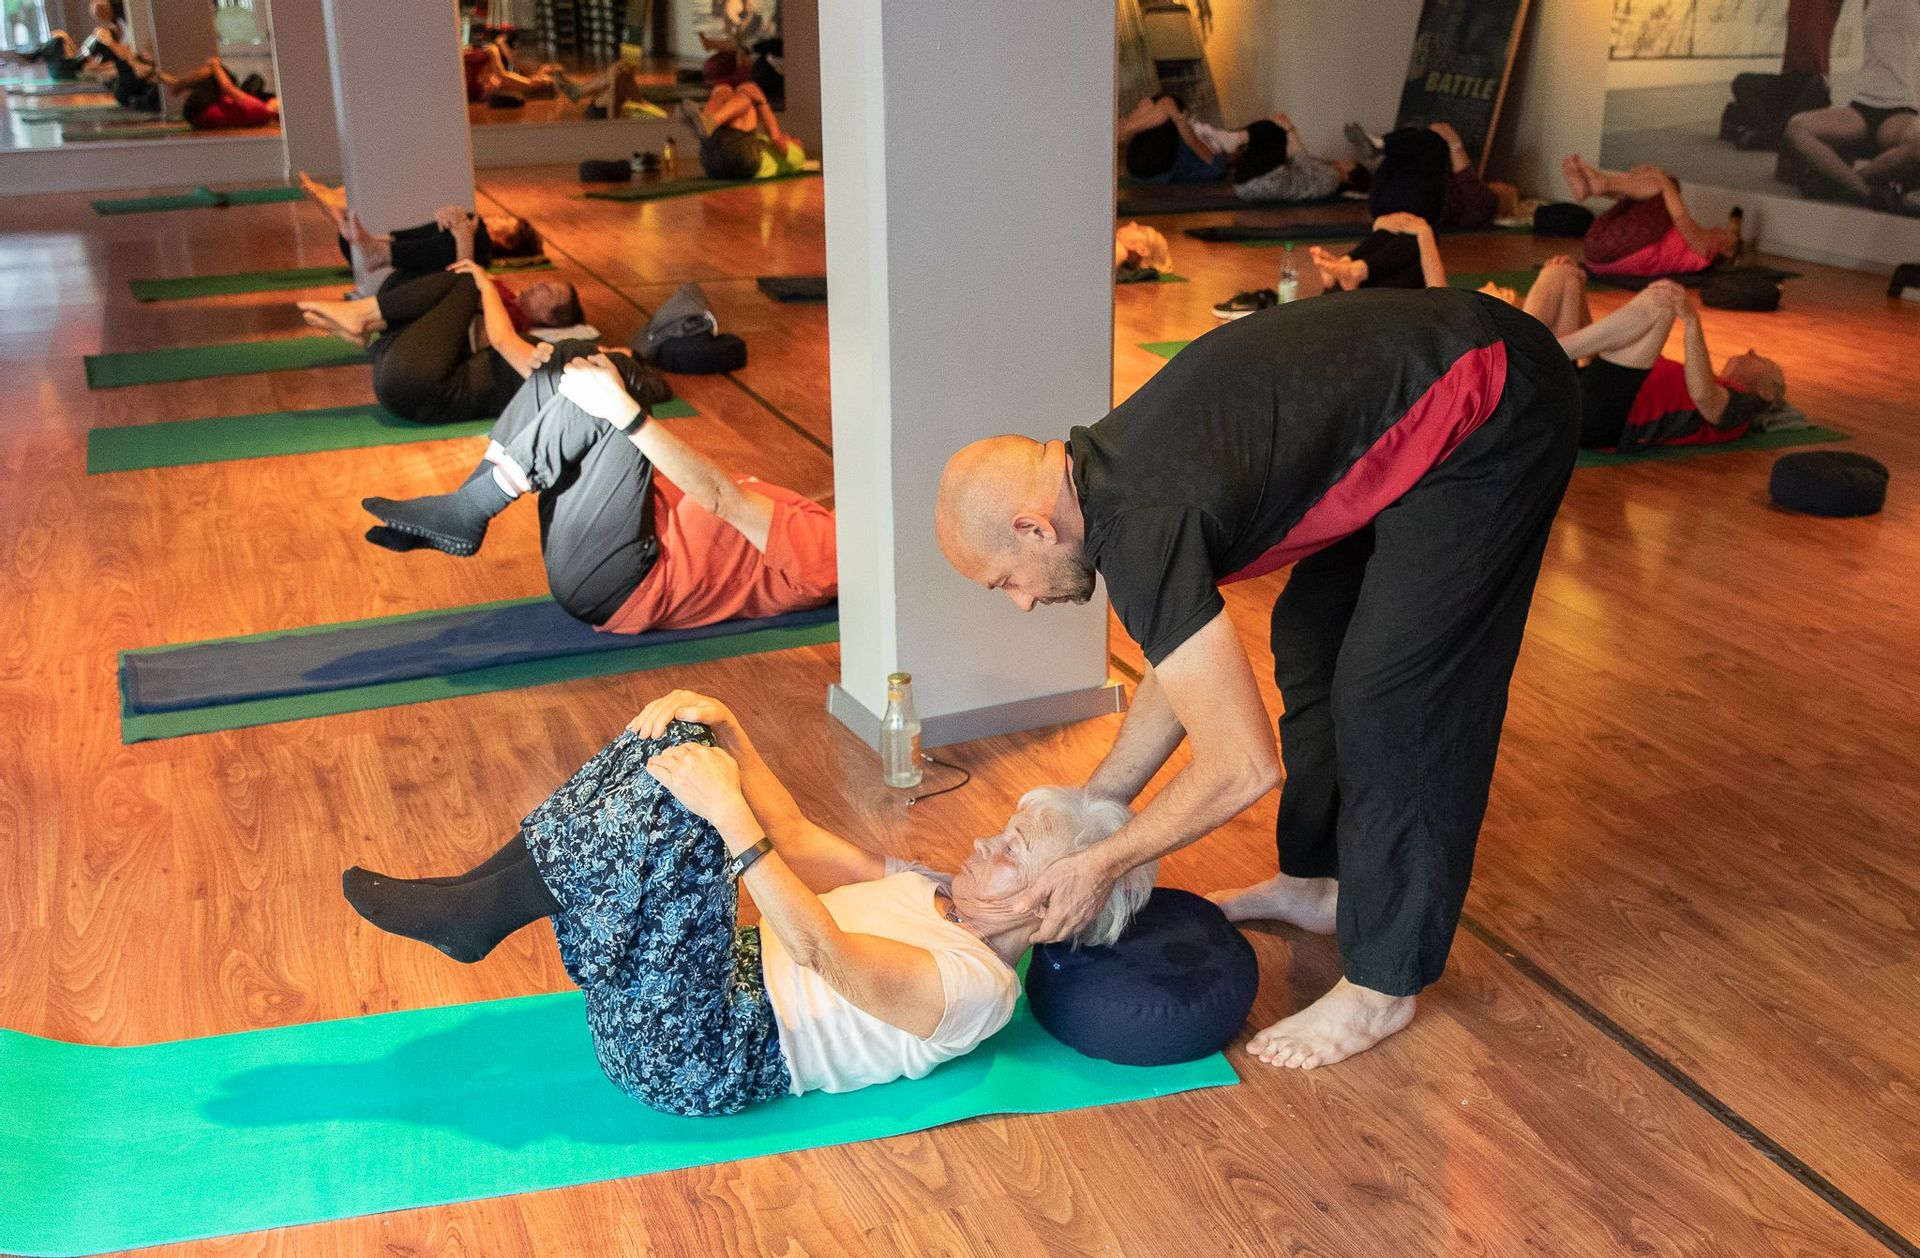 Bewegung als Medizin - Kursplan- med. Kurse